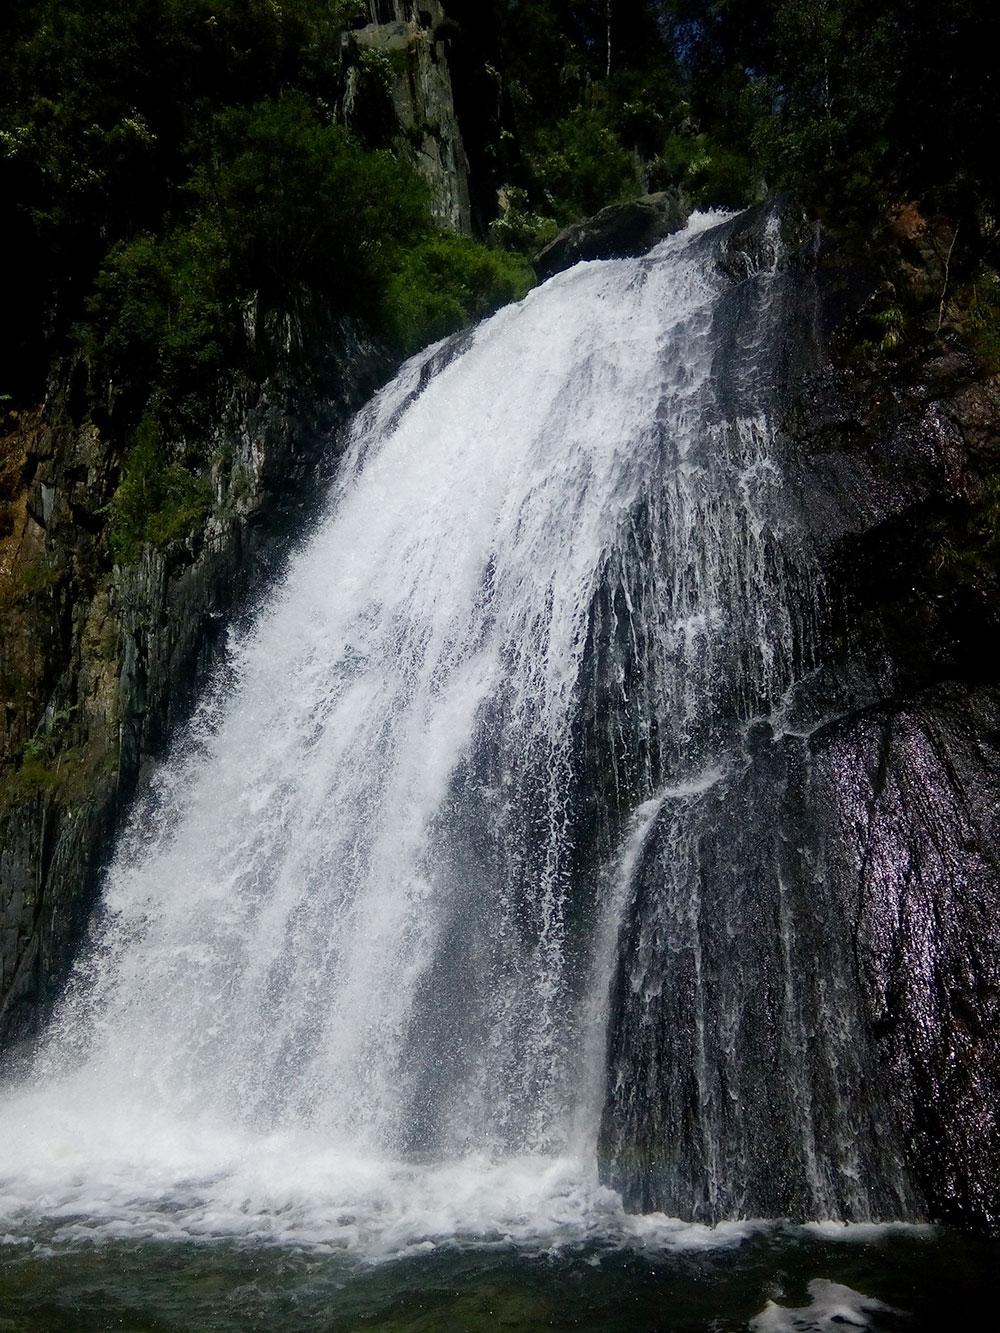 Водопад Корбу, который я увидела во время прогулки на теплоходе «Пионер Алтая»